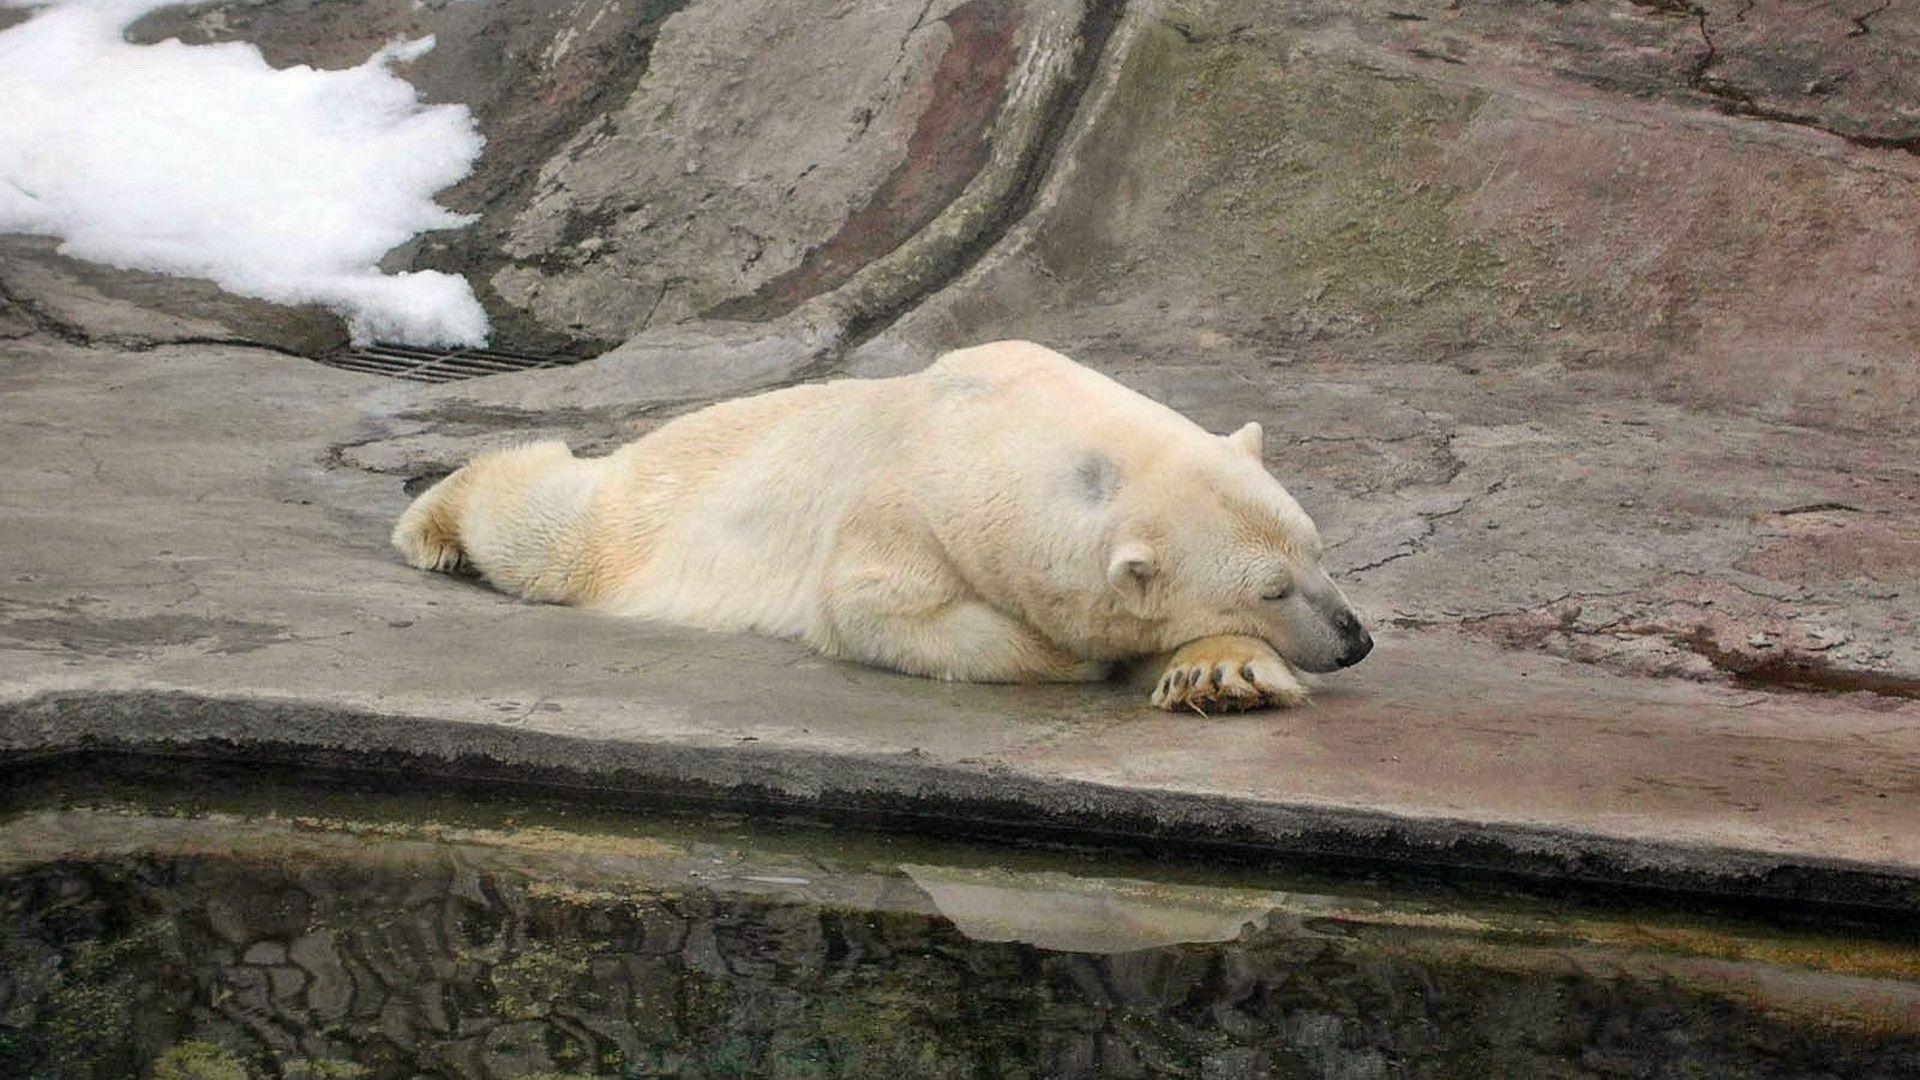 bear, polar bear, nature reserve - http://www.wallpapers4u.org/bear-polar-bear-nature-reserve/